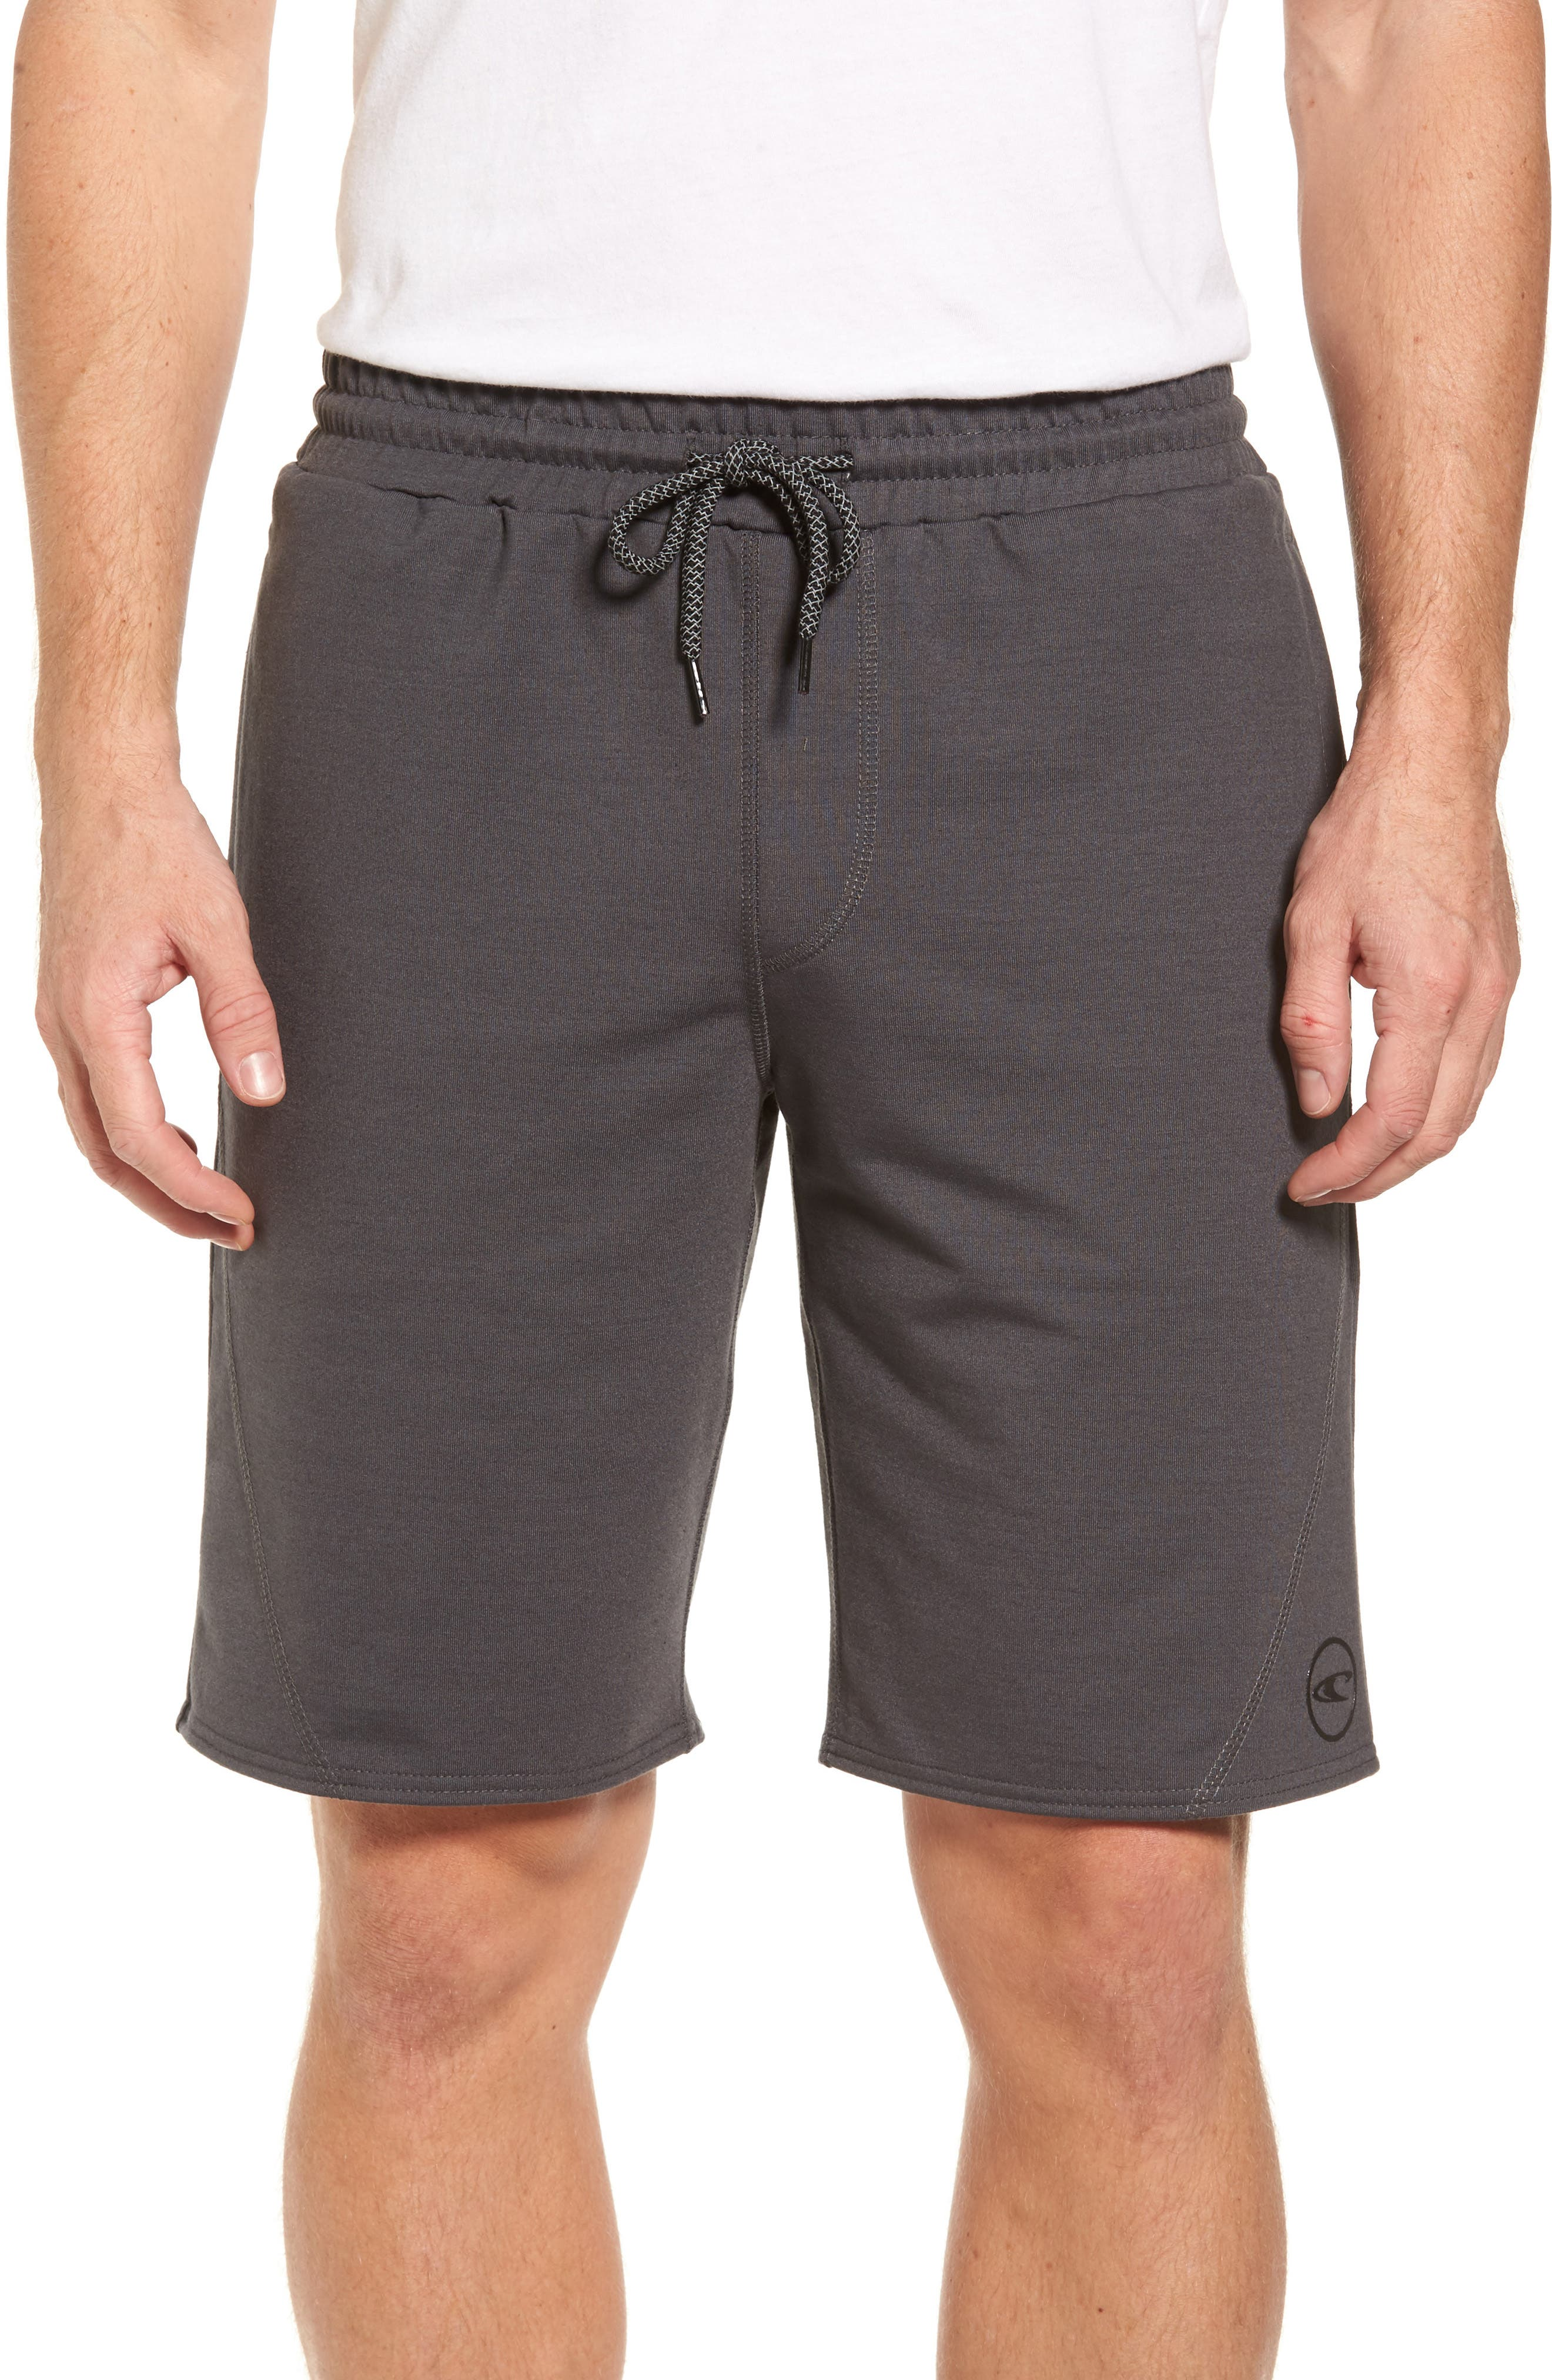 Traveler Fleece Shorts,                             Main thumbnail 1, color,                             020